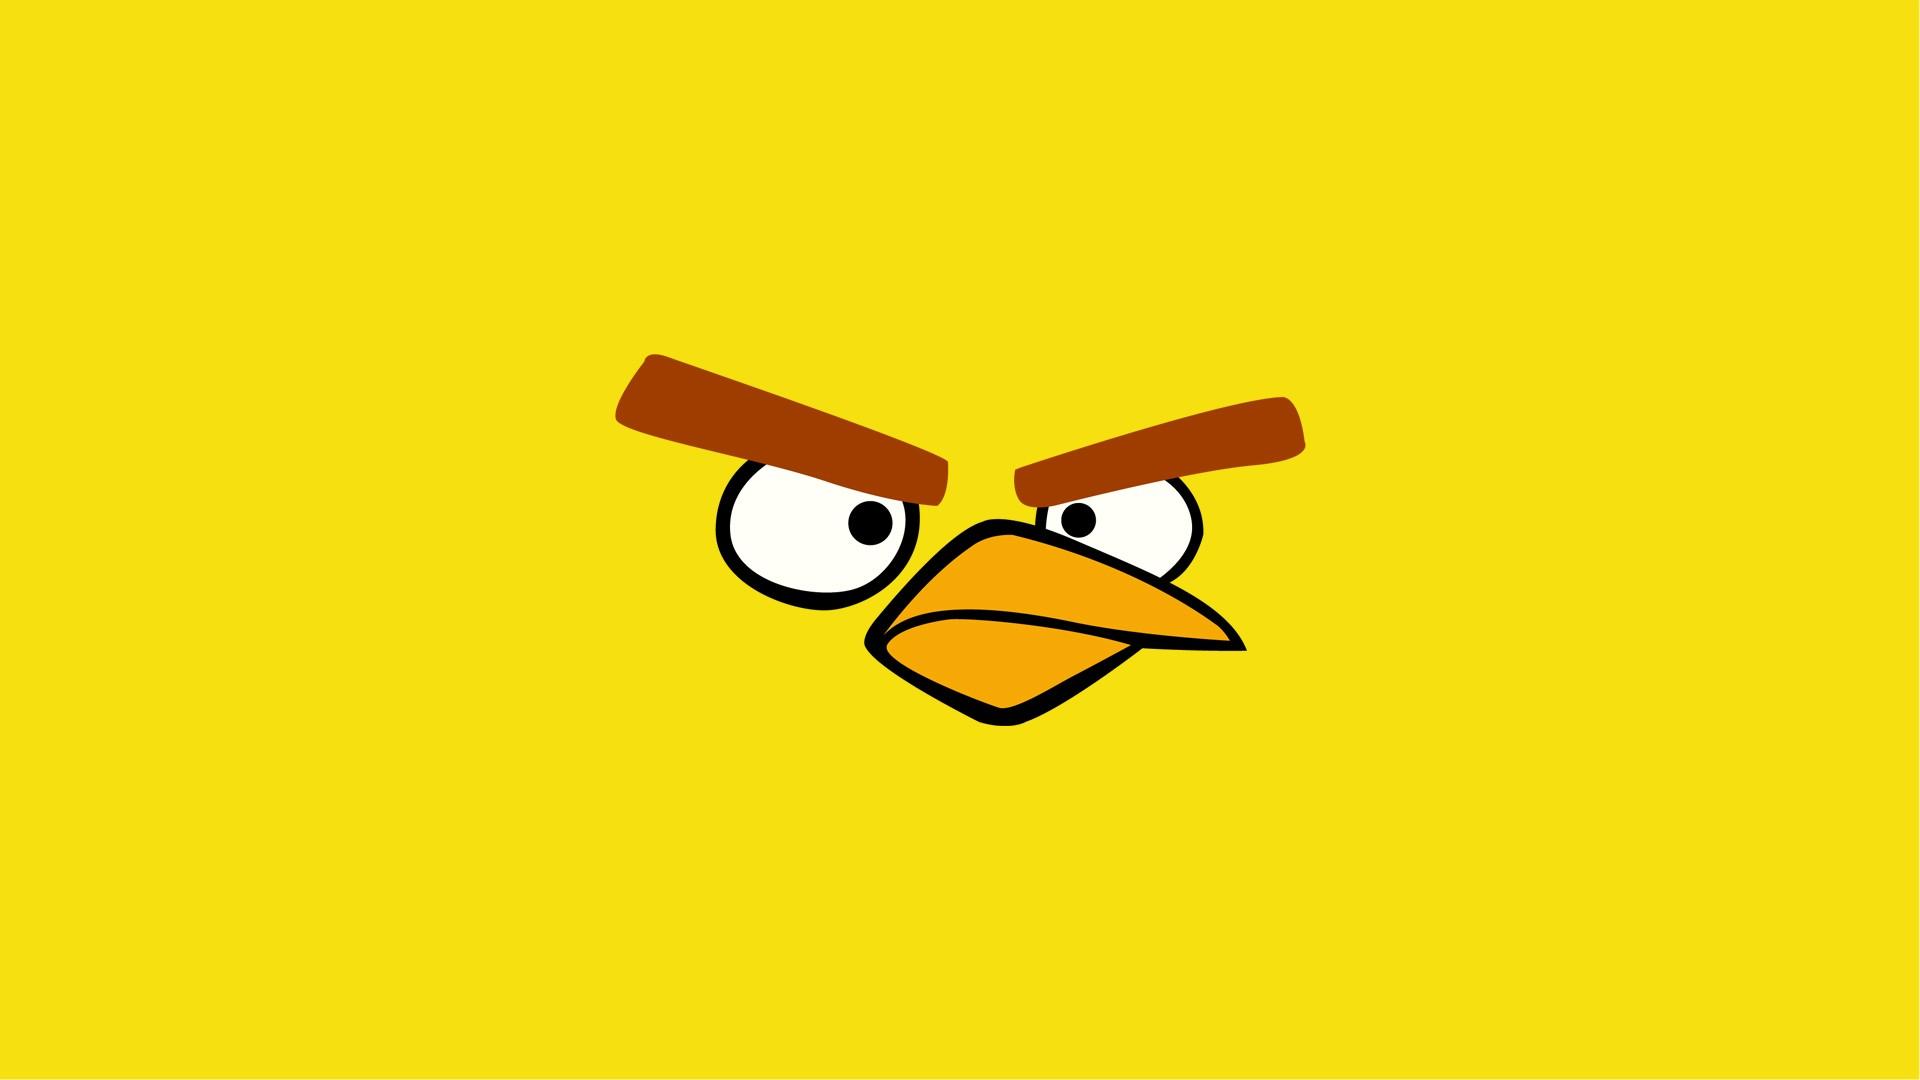 angry bird hd wallpaper A1